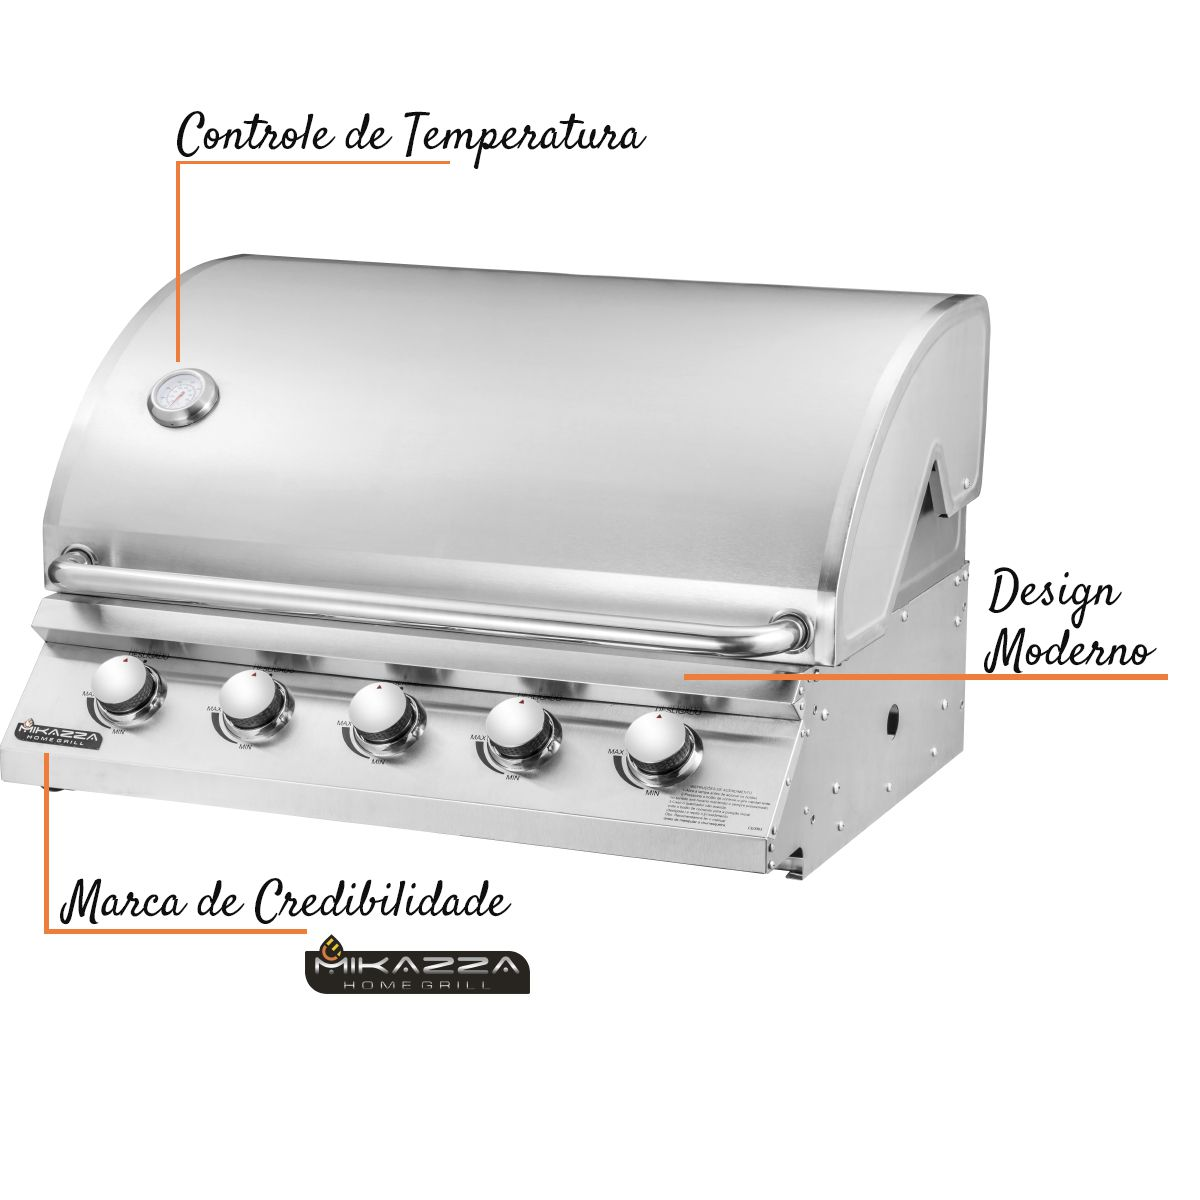 Churrasqueira à Gás Embutir Mikazza Pro 5